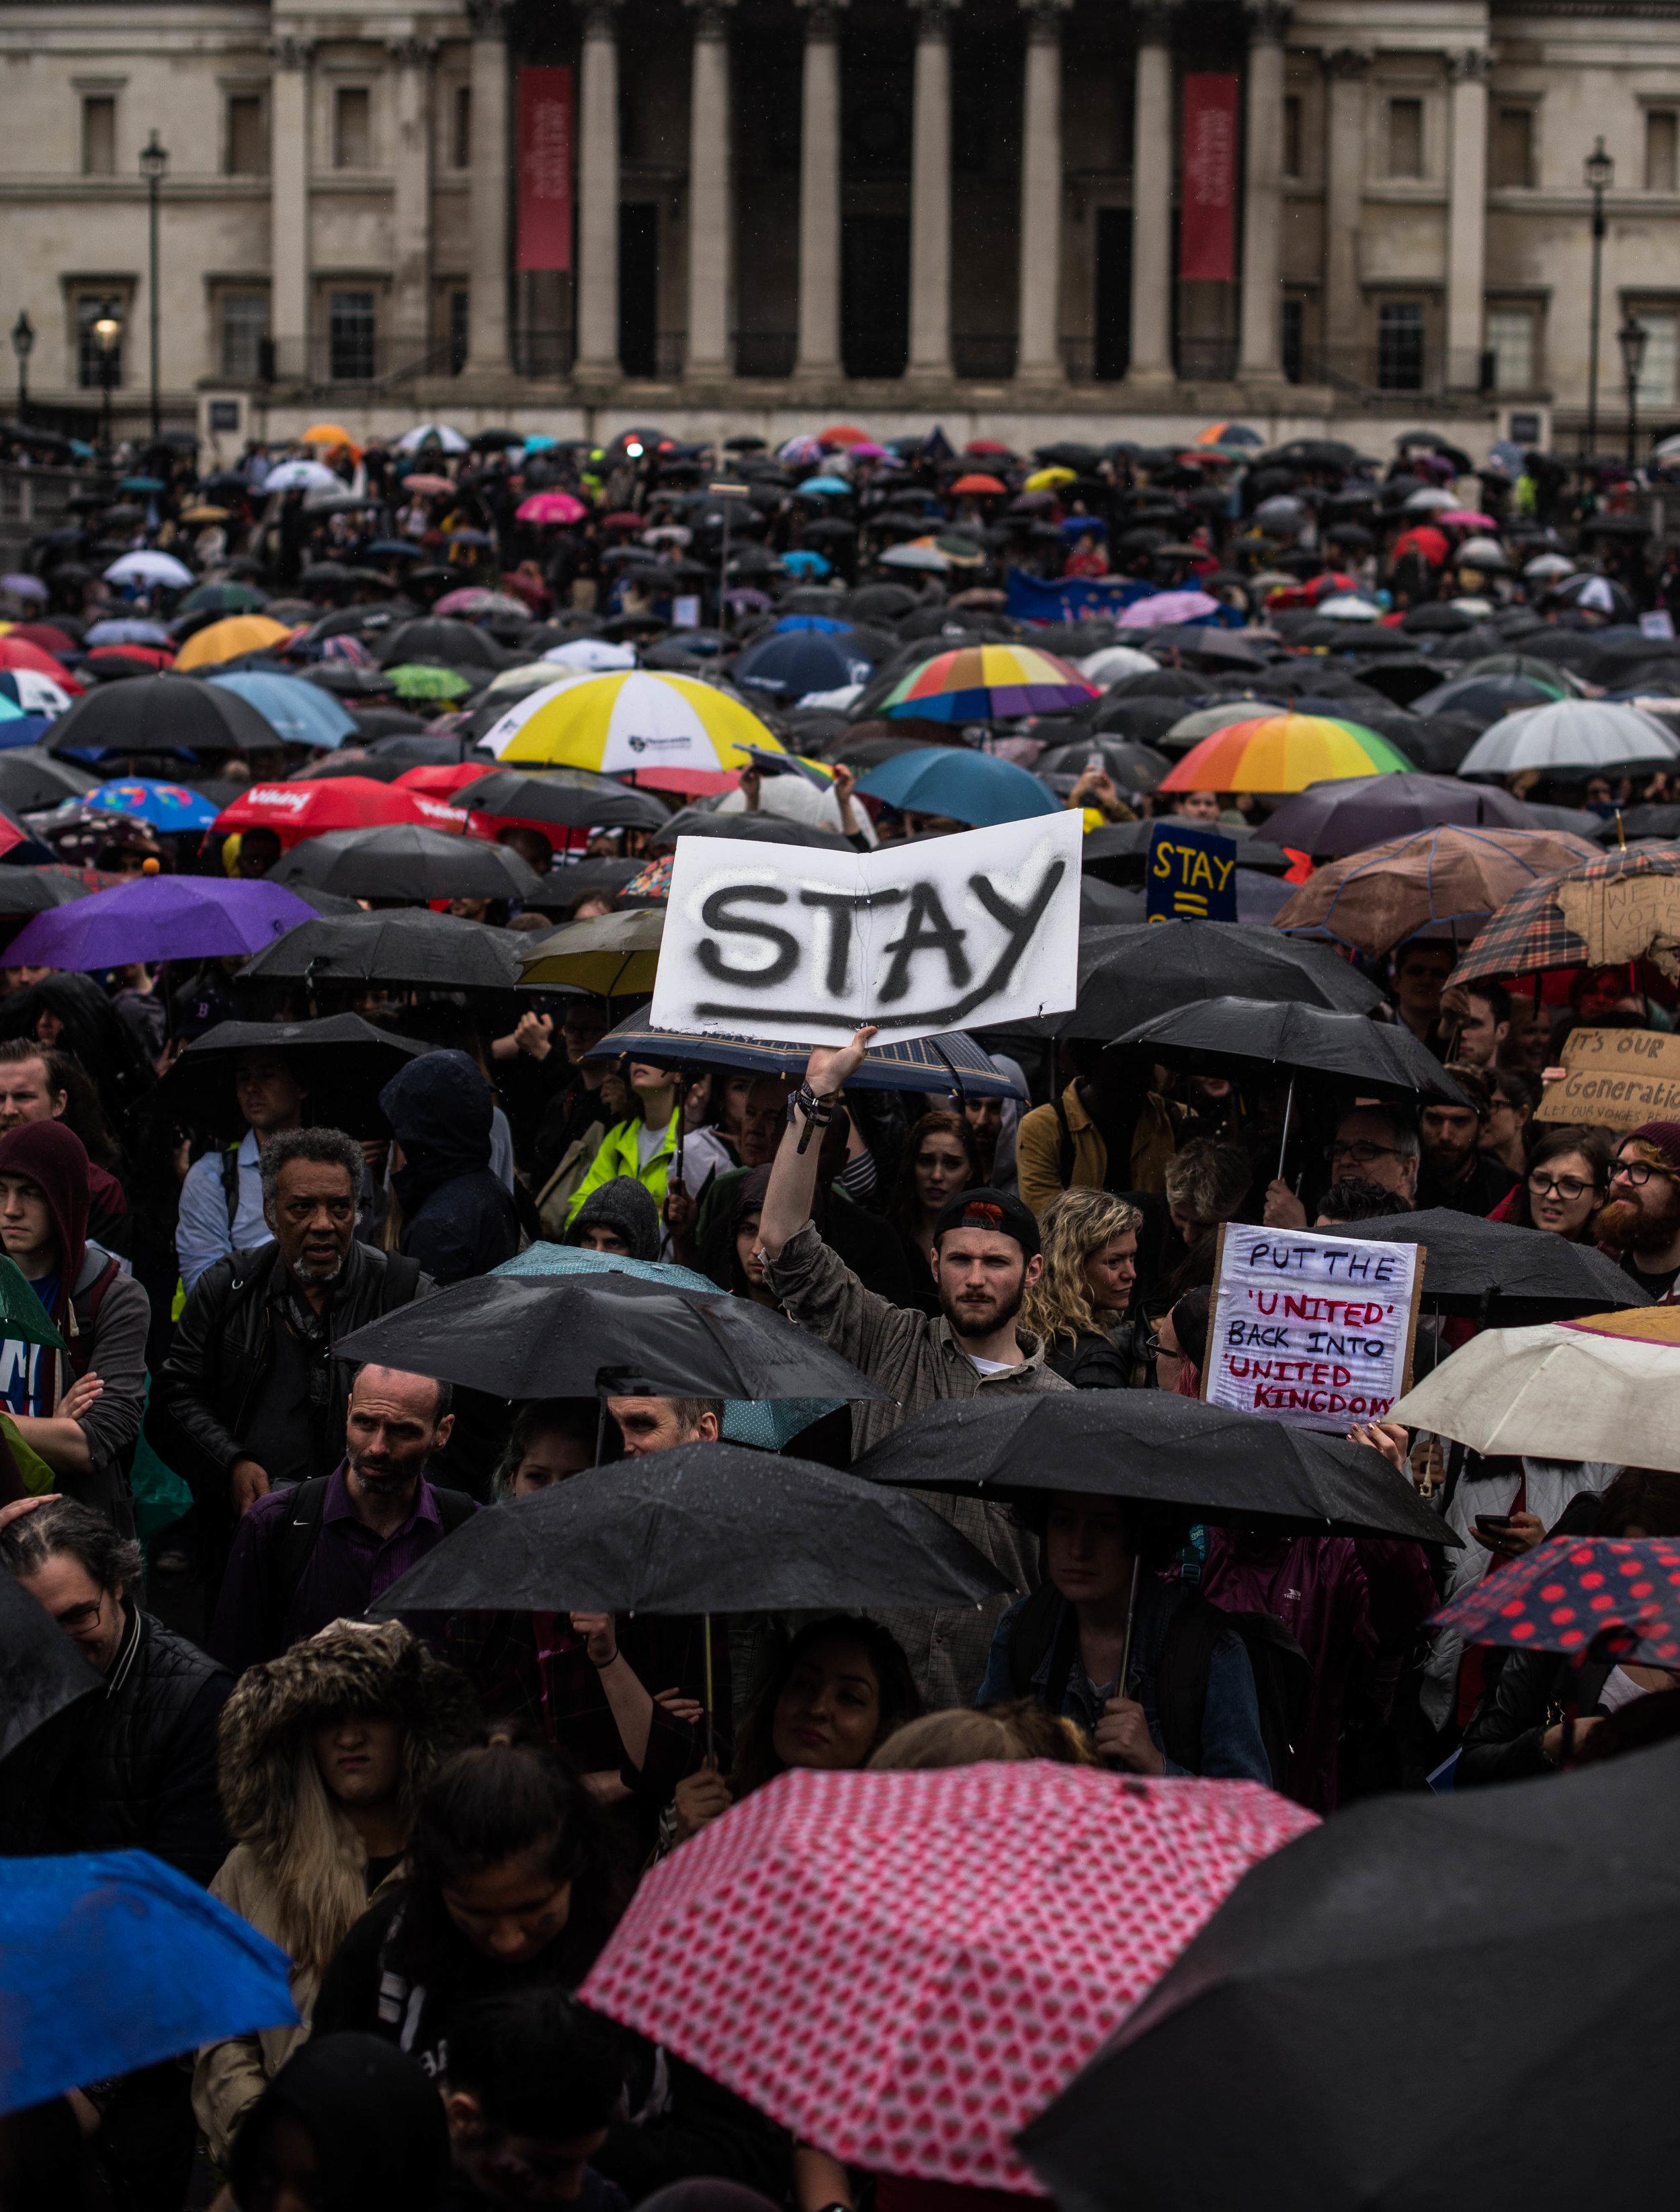 Brexit protest, London. ©Aiyush Pachnanda